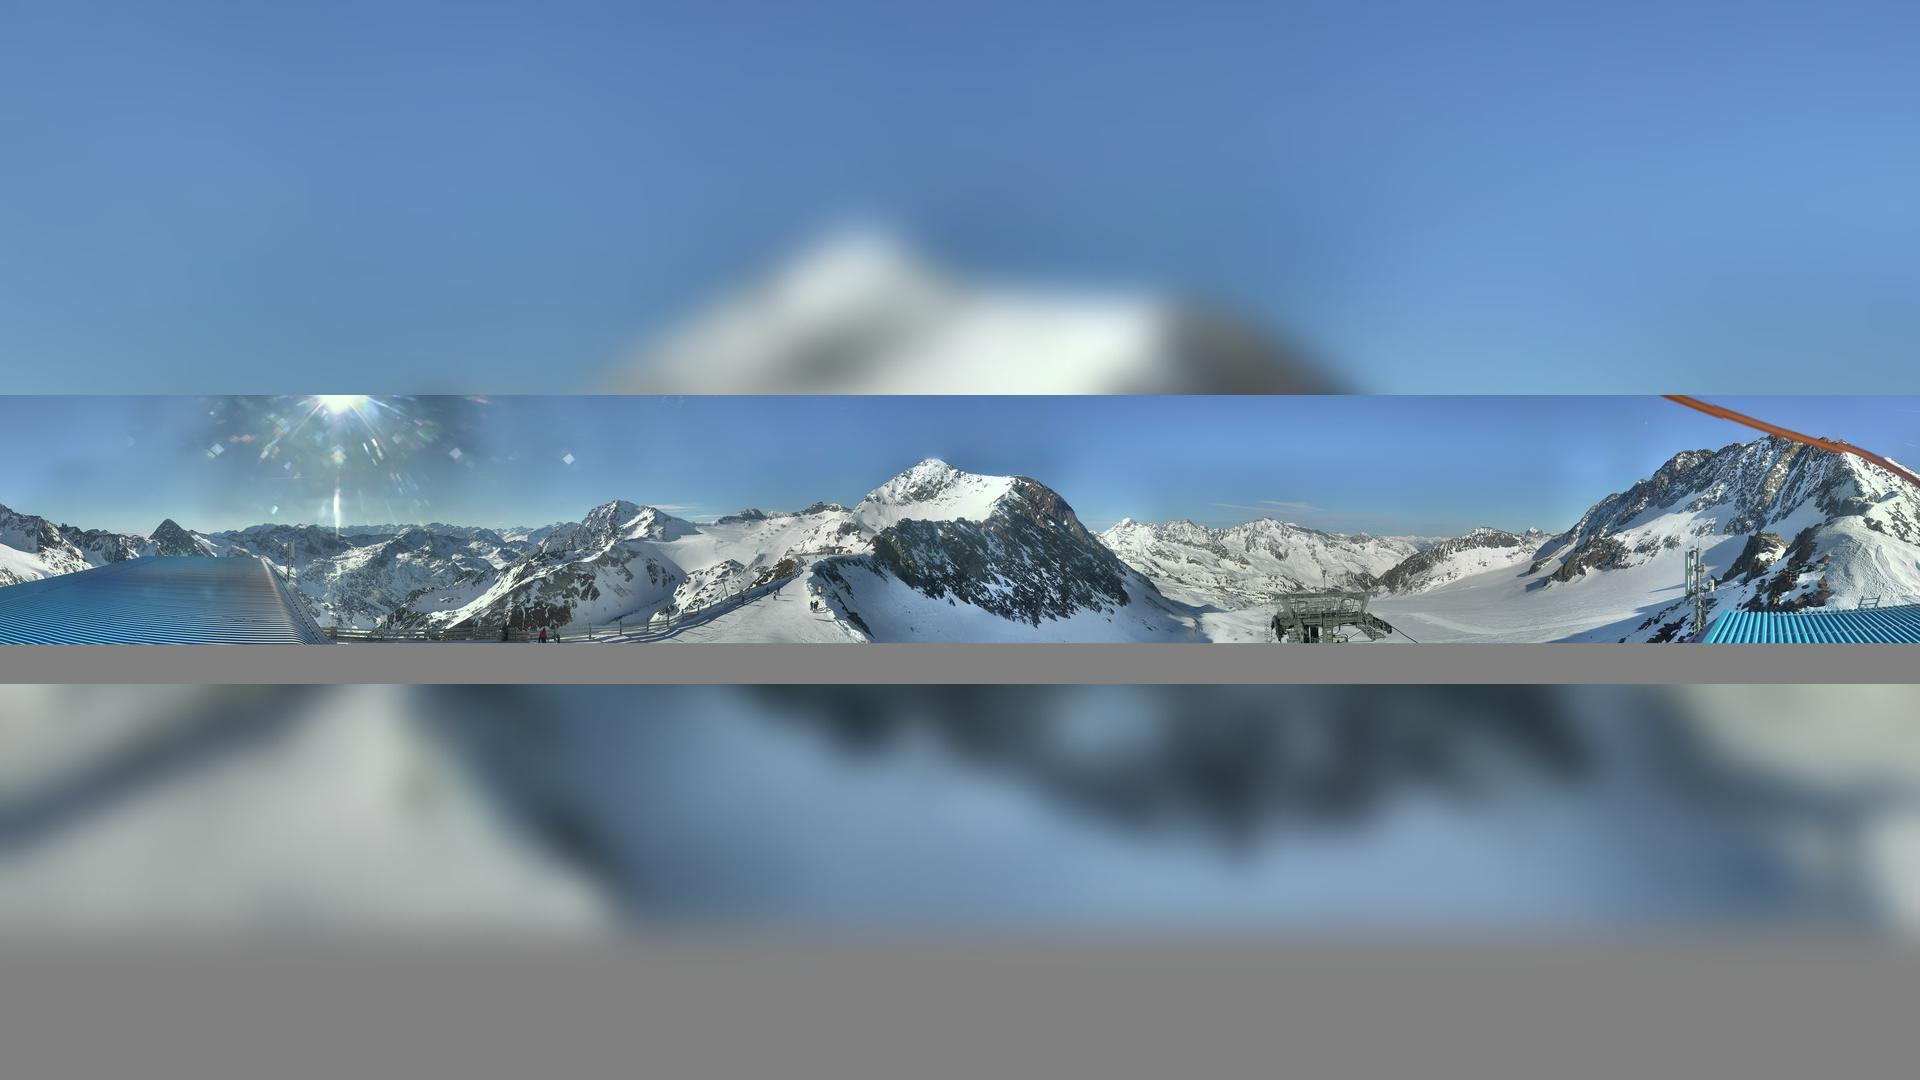 Webkamera Mutterbergalm: Fernau Stubaier Gletscher